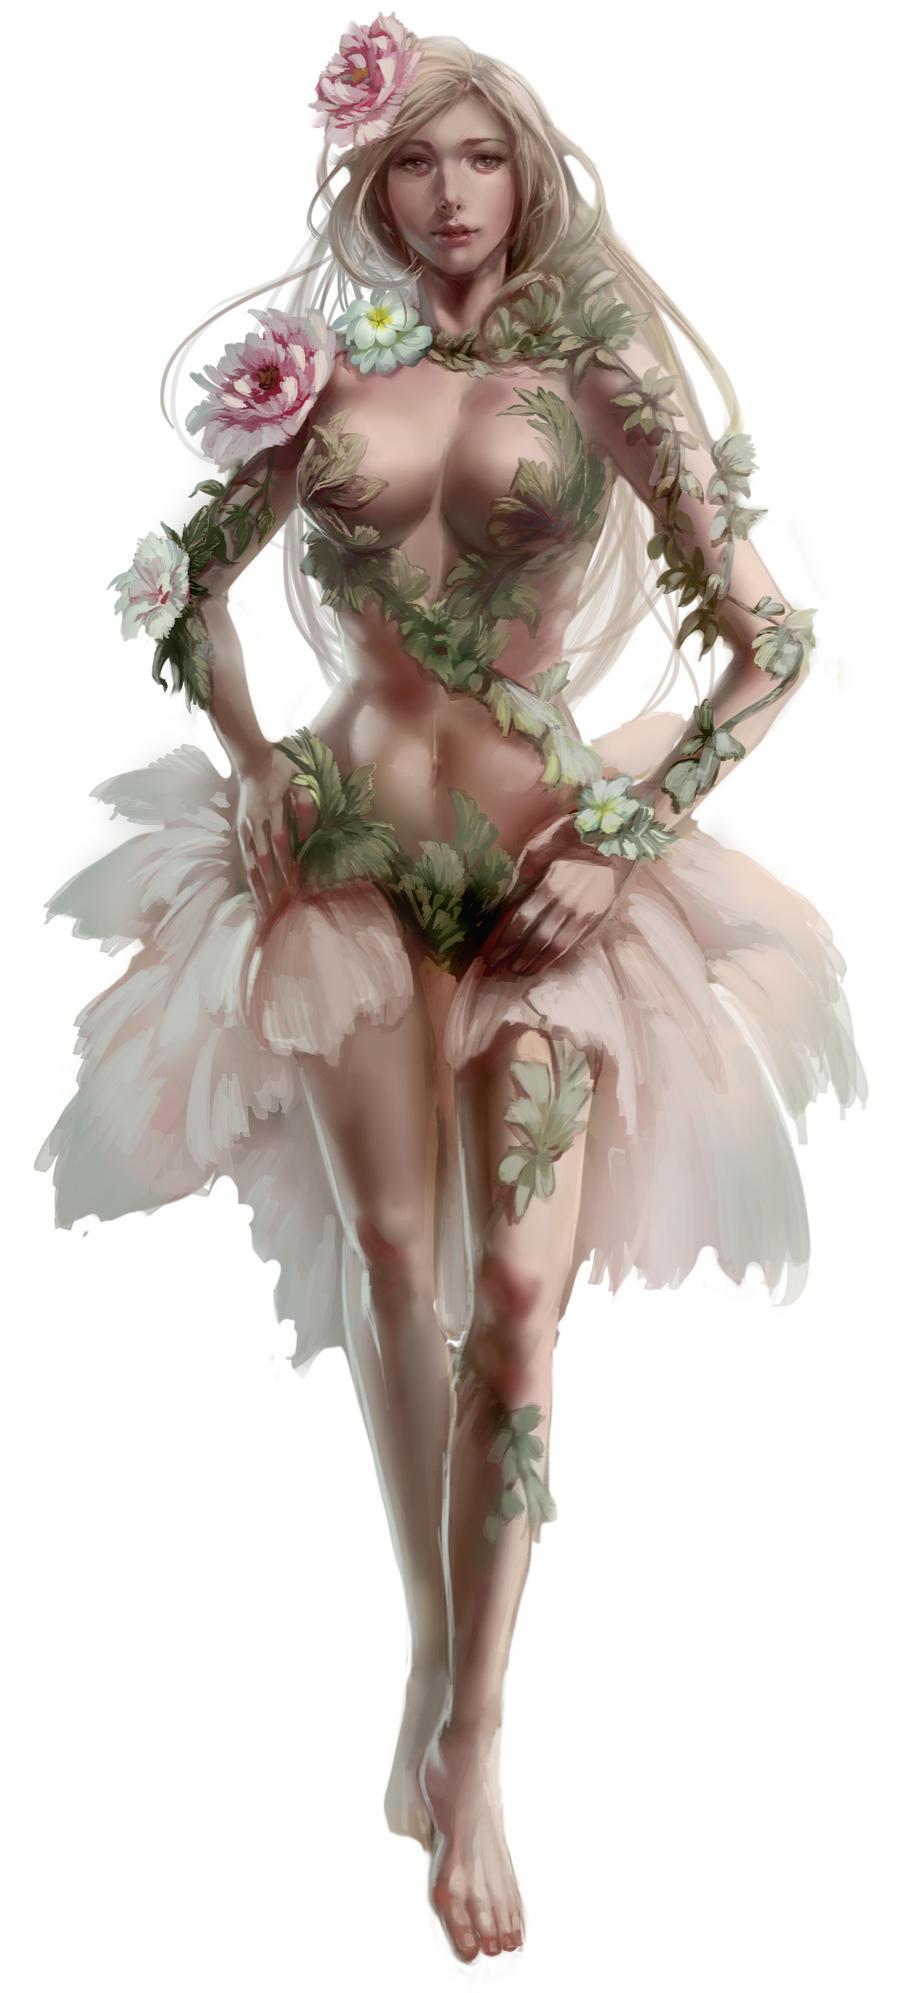 http://fc04.deviantart.net/fs71/i/2012/033/3/1/women__s_suit_plant_by_xiaobotong-d4oe32r.jpg